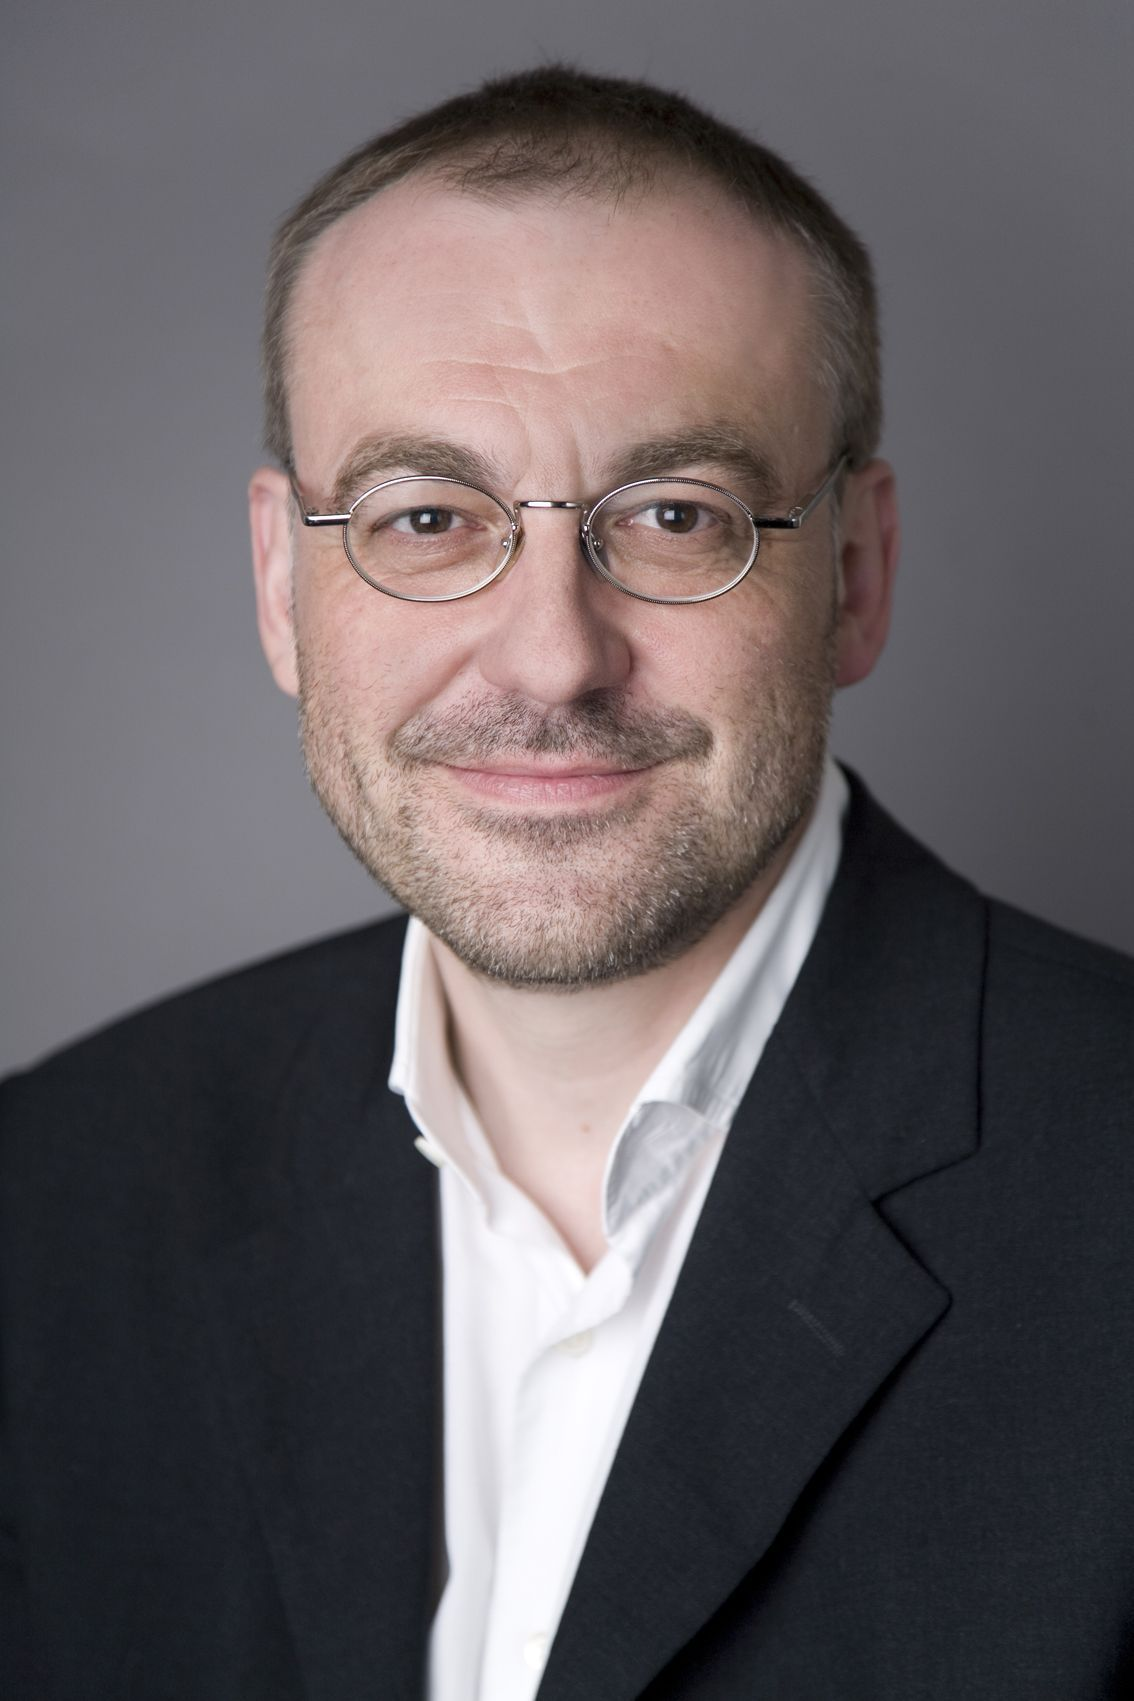 Prof. Thomas Bauer